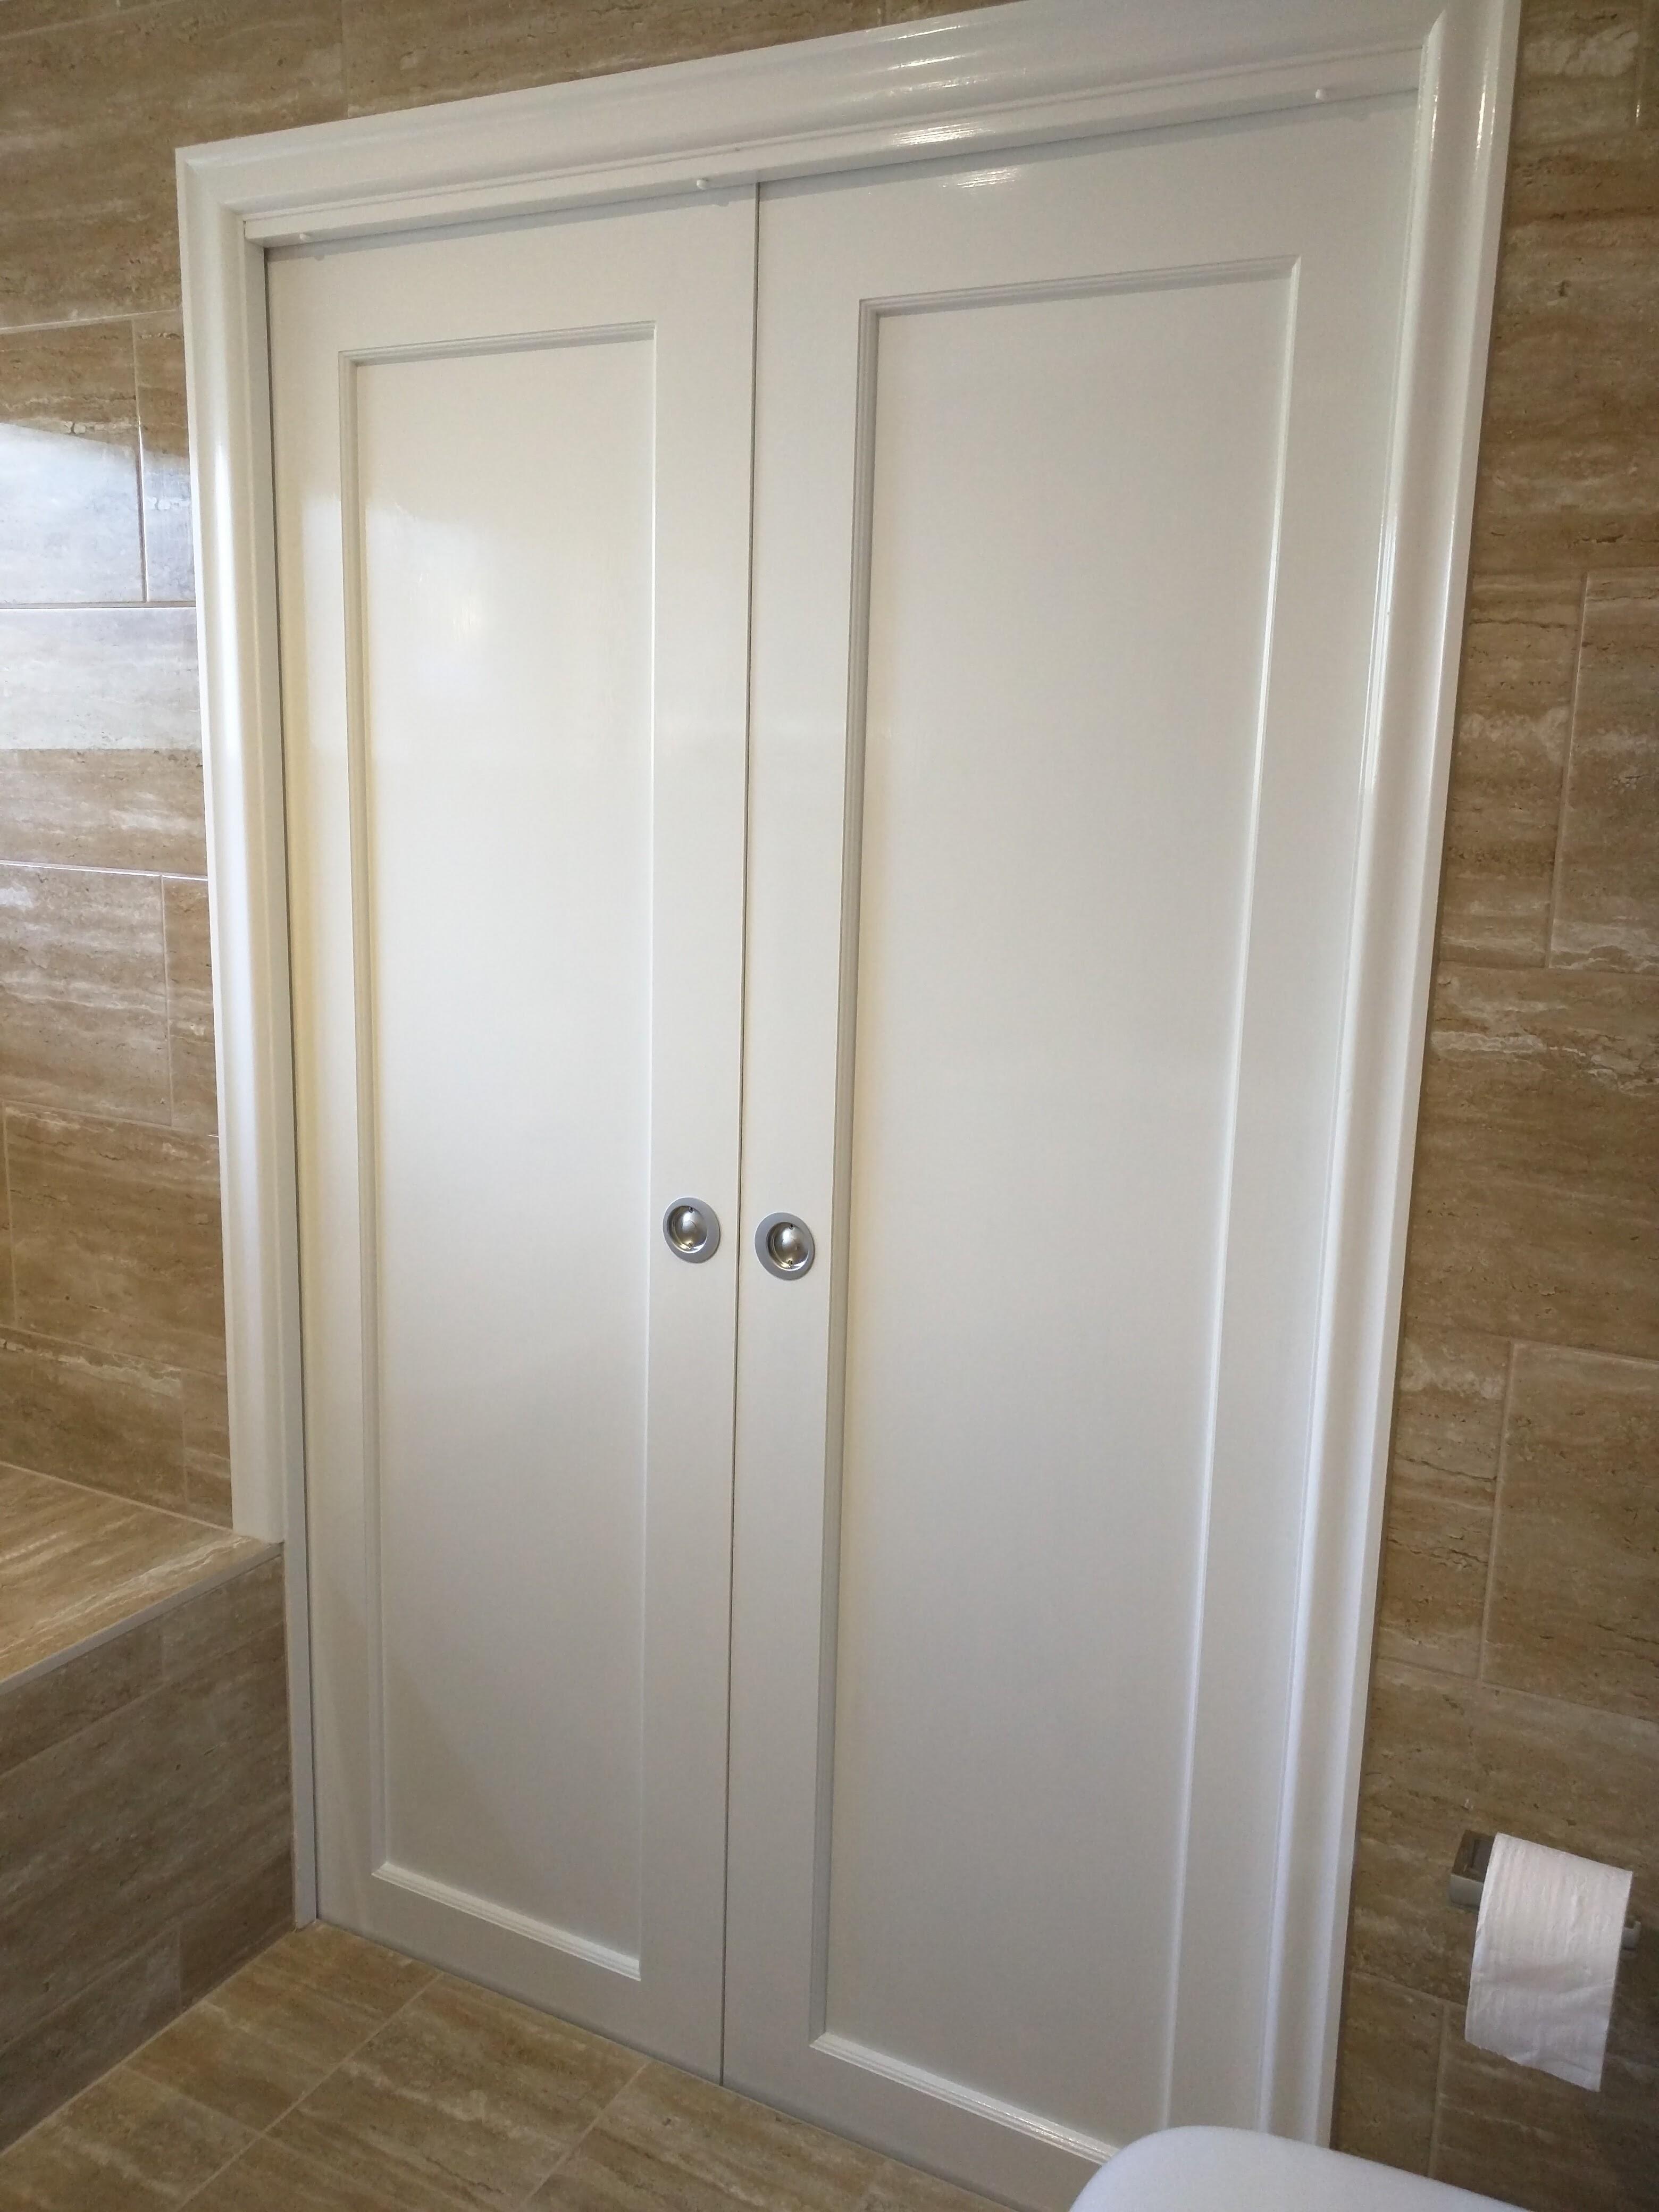 Sliding Doors for Garage Renovation Bathroom